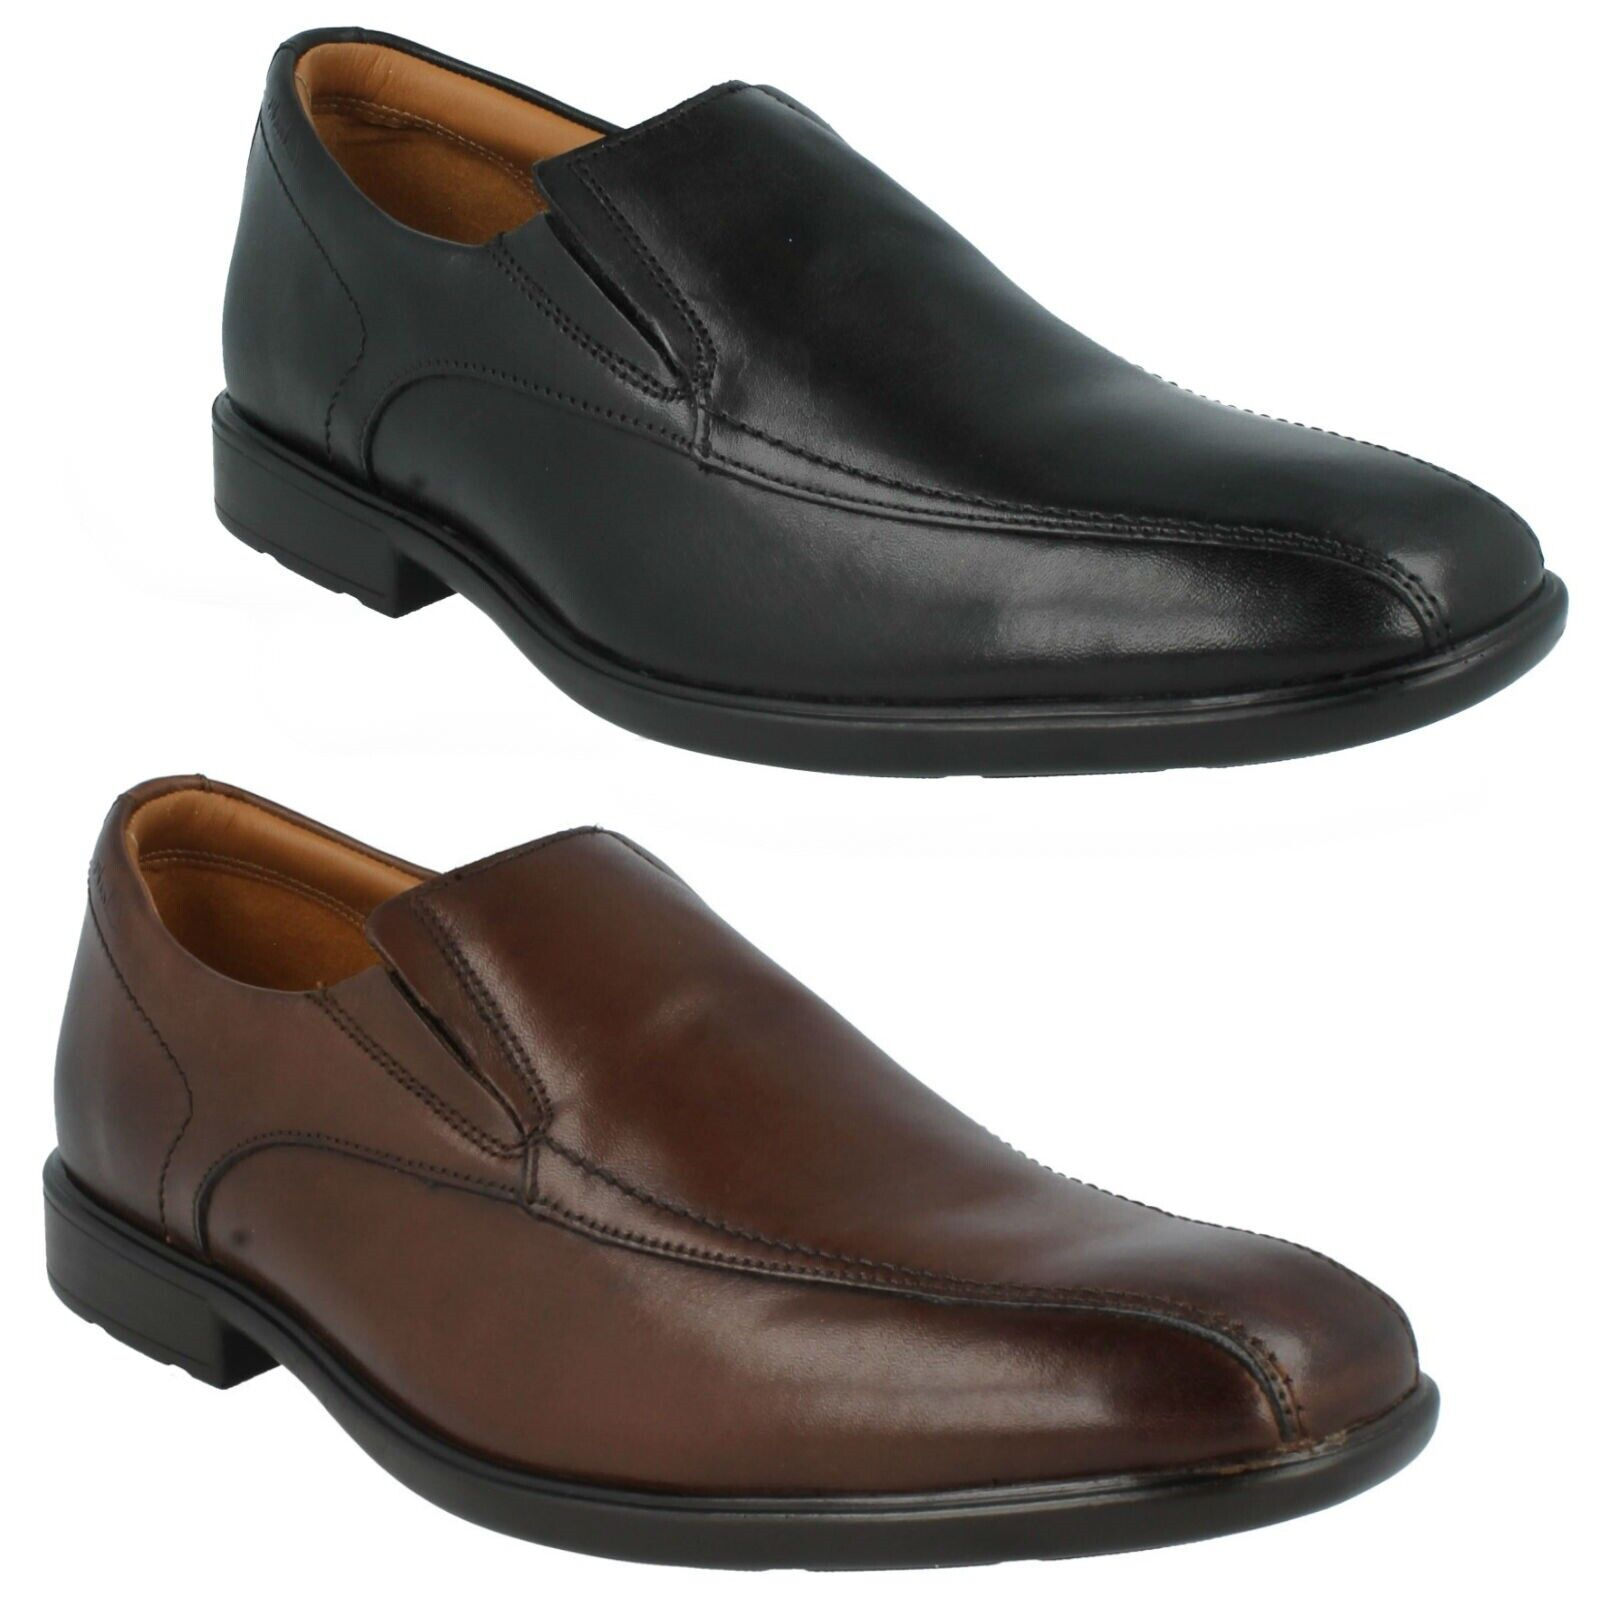 GOSWORTH STEP MENS CLARKS LEATHER SMART SLIP ON SHOES FORMAL DRESS LOAFERS